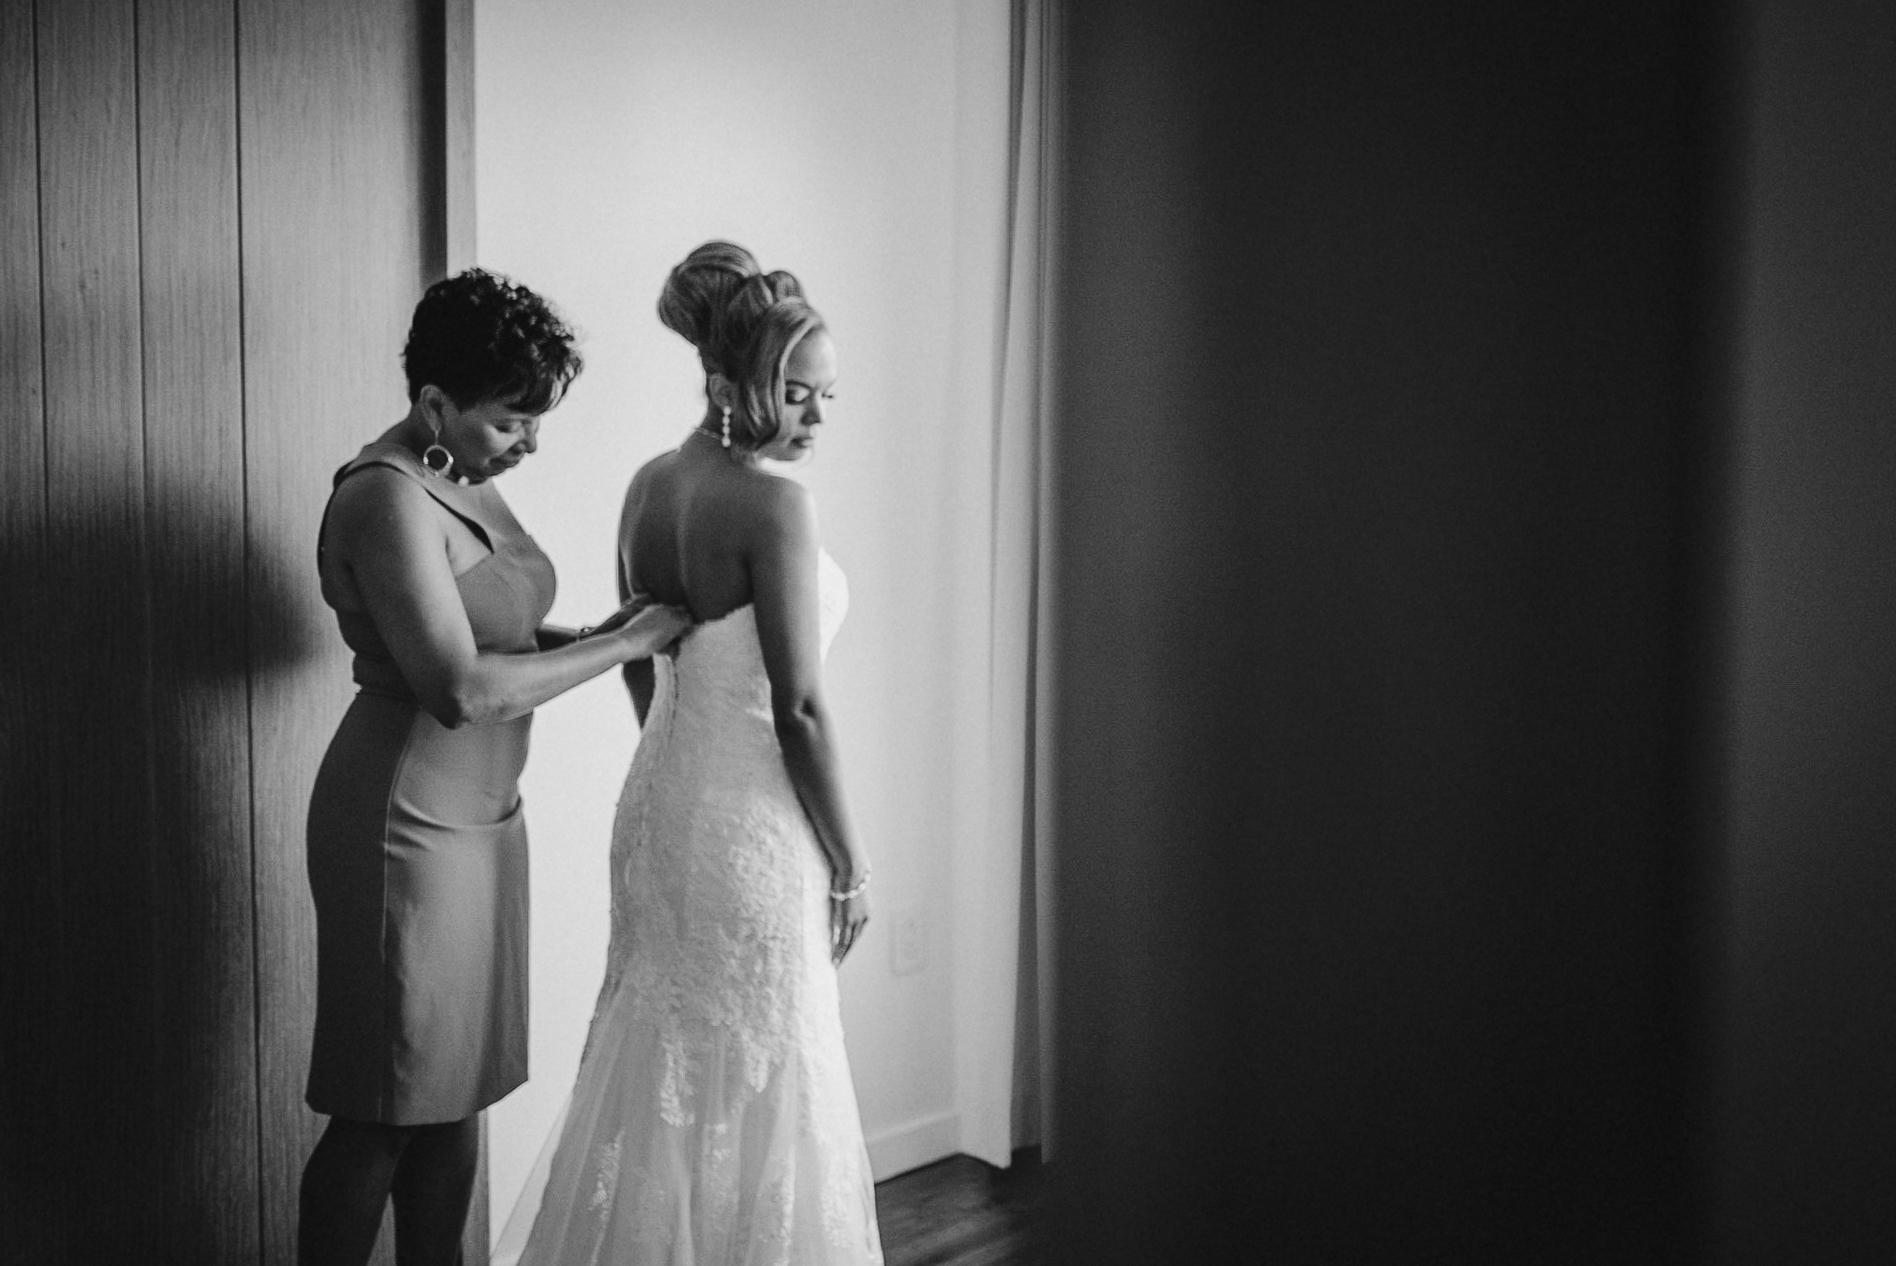 bride getting into wedding dress at The Park Hyatt Hotel in Washington DC